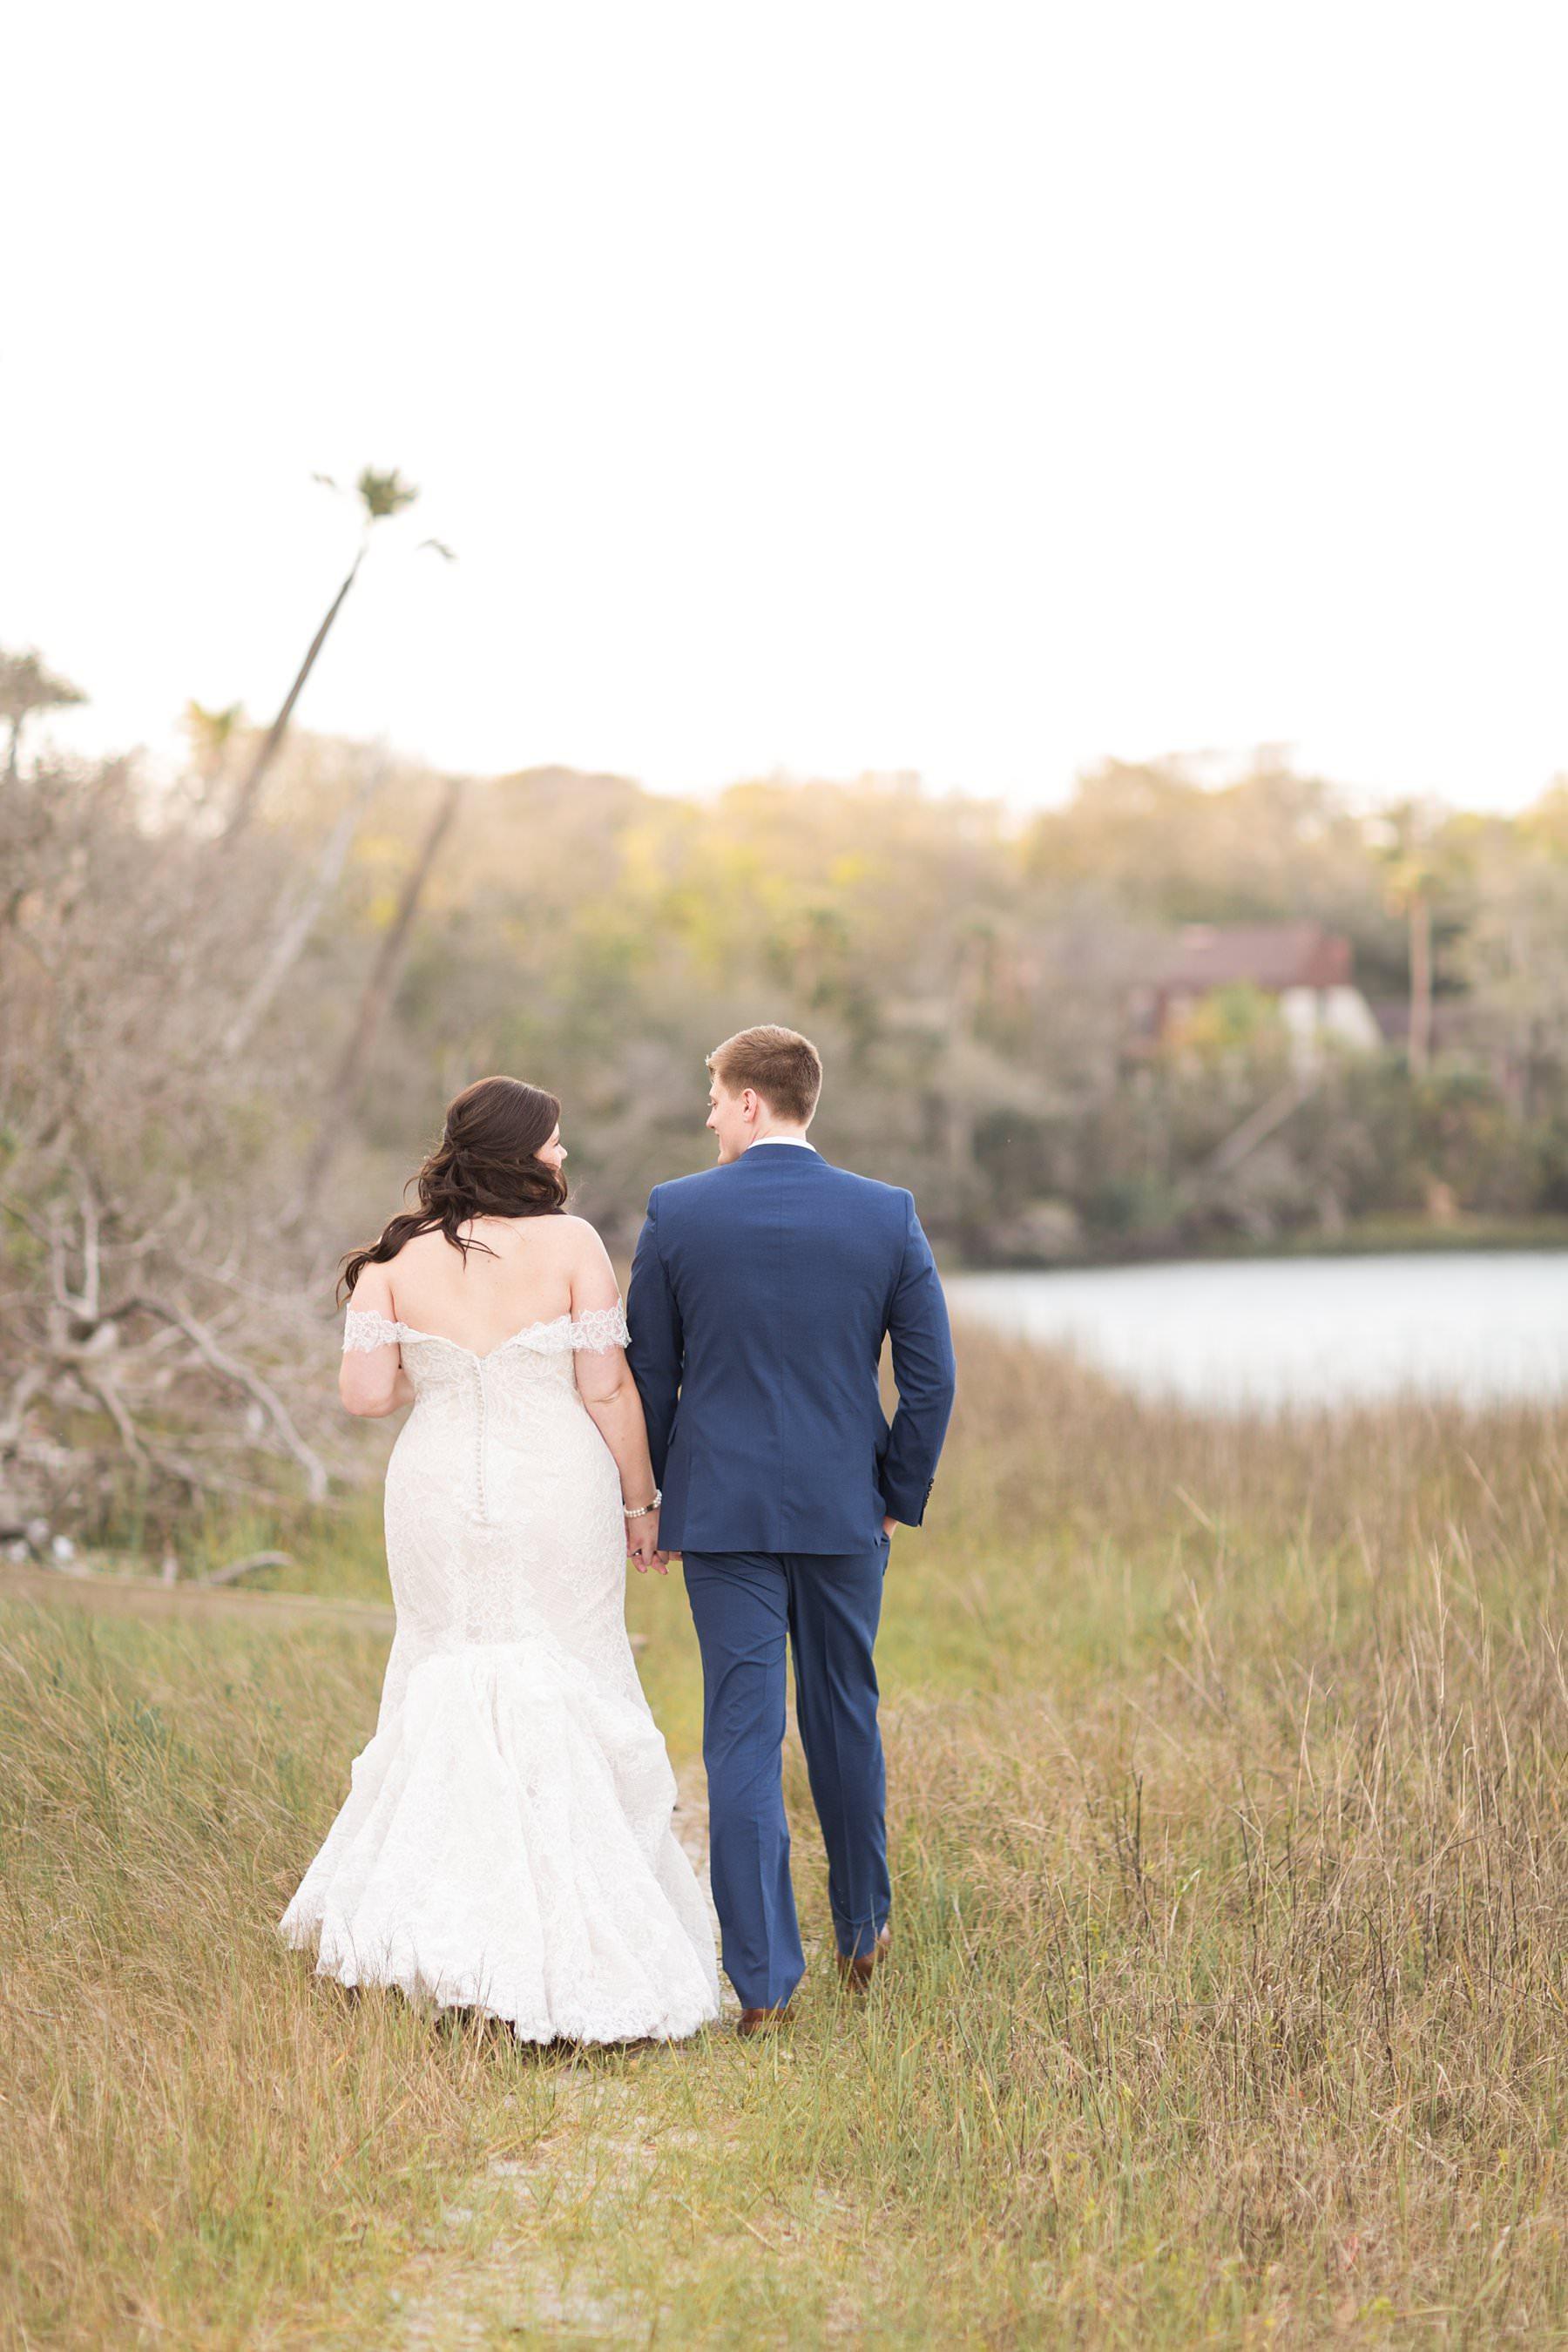 Ribault Club Wedding in Jacksonville - Bri Cibene Photography